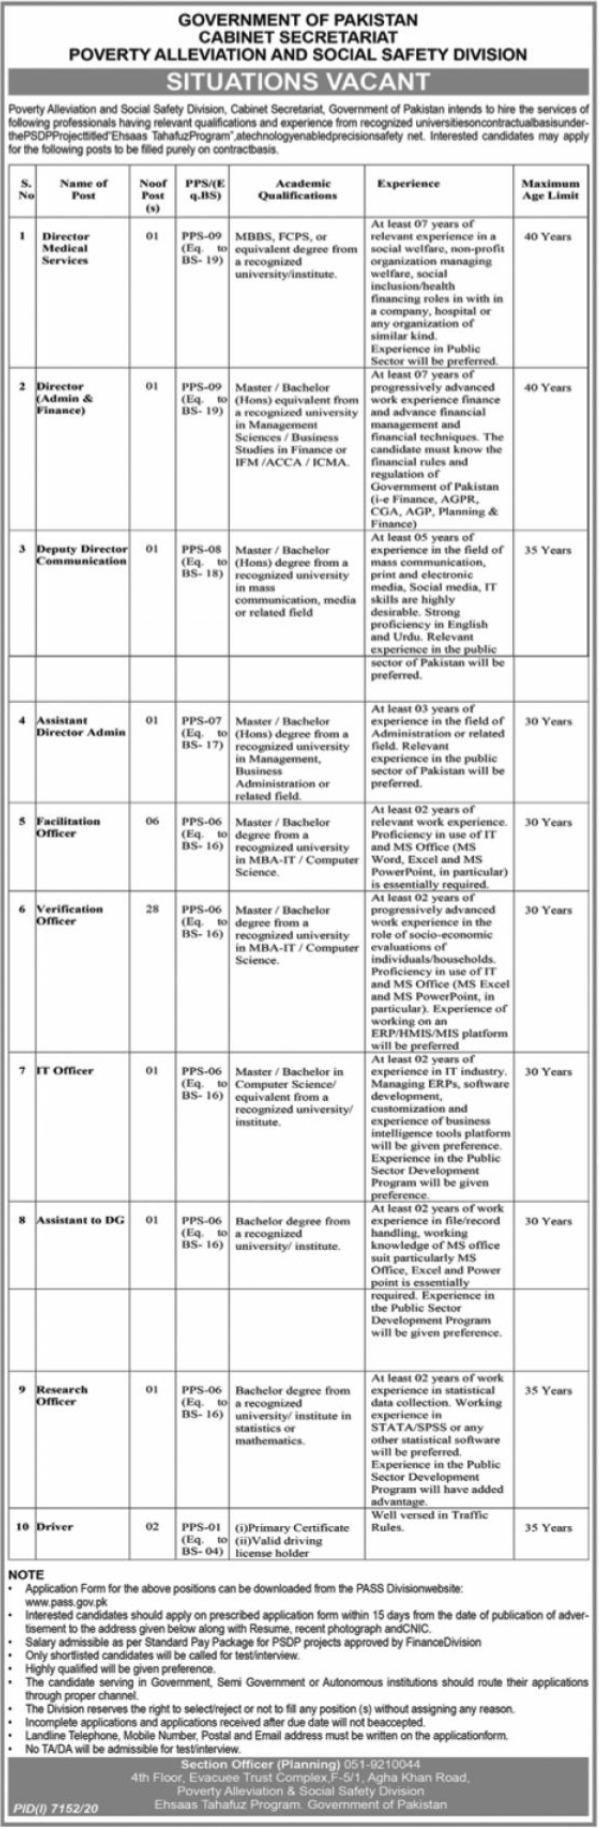 Cabinet Secretariat, Poverty Alleviation & Social Safety Division Jobs 2021